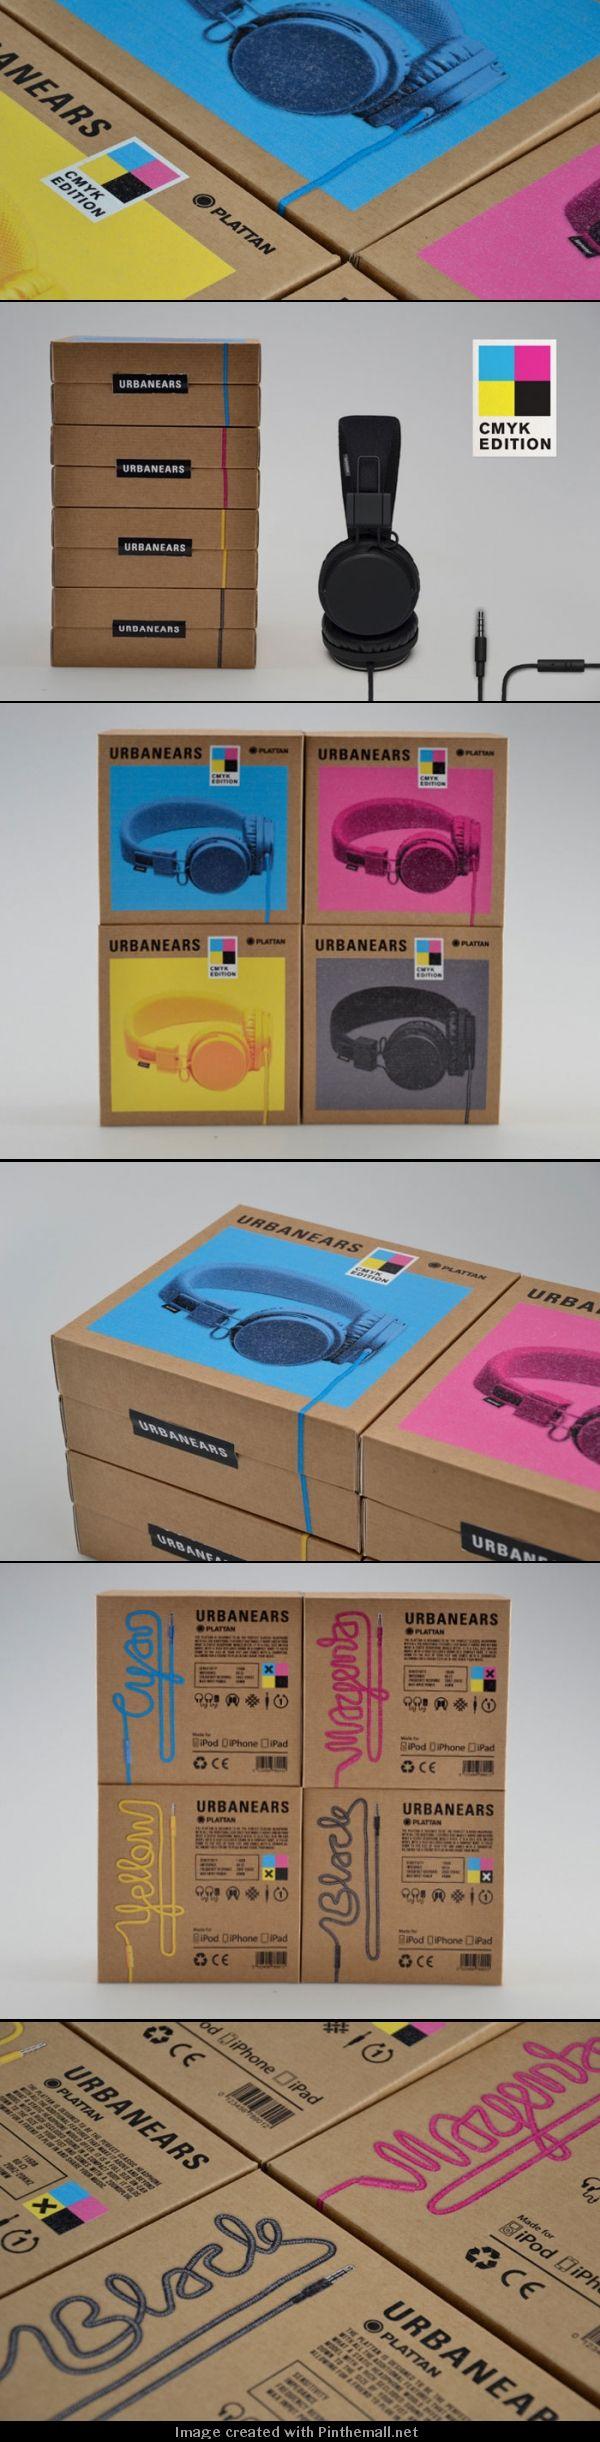 UrbanEars PD